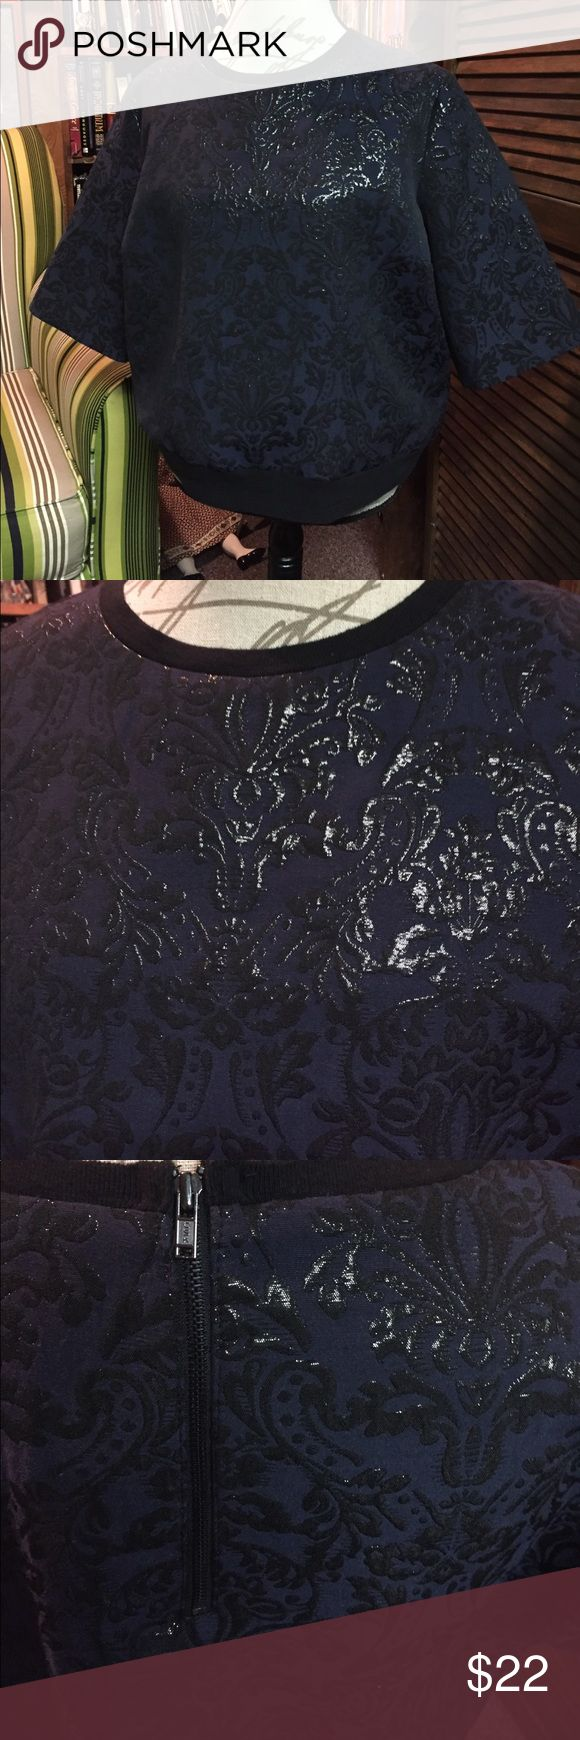 Simply Vera navy shirt with black detailing XL Navy short sleeve top with black detailing on front and back, Size XL. Zipper closure at back neckline, and banded waistline Simply Vera Vera Wang Tops Tees - Short Sleeve